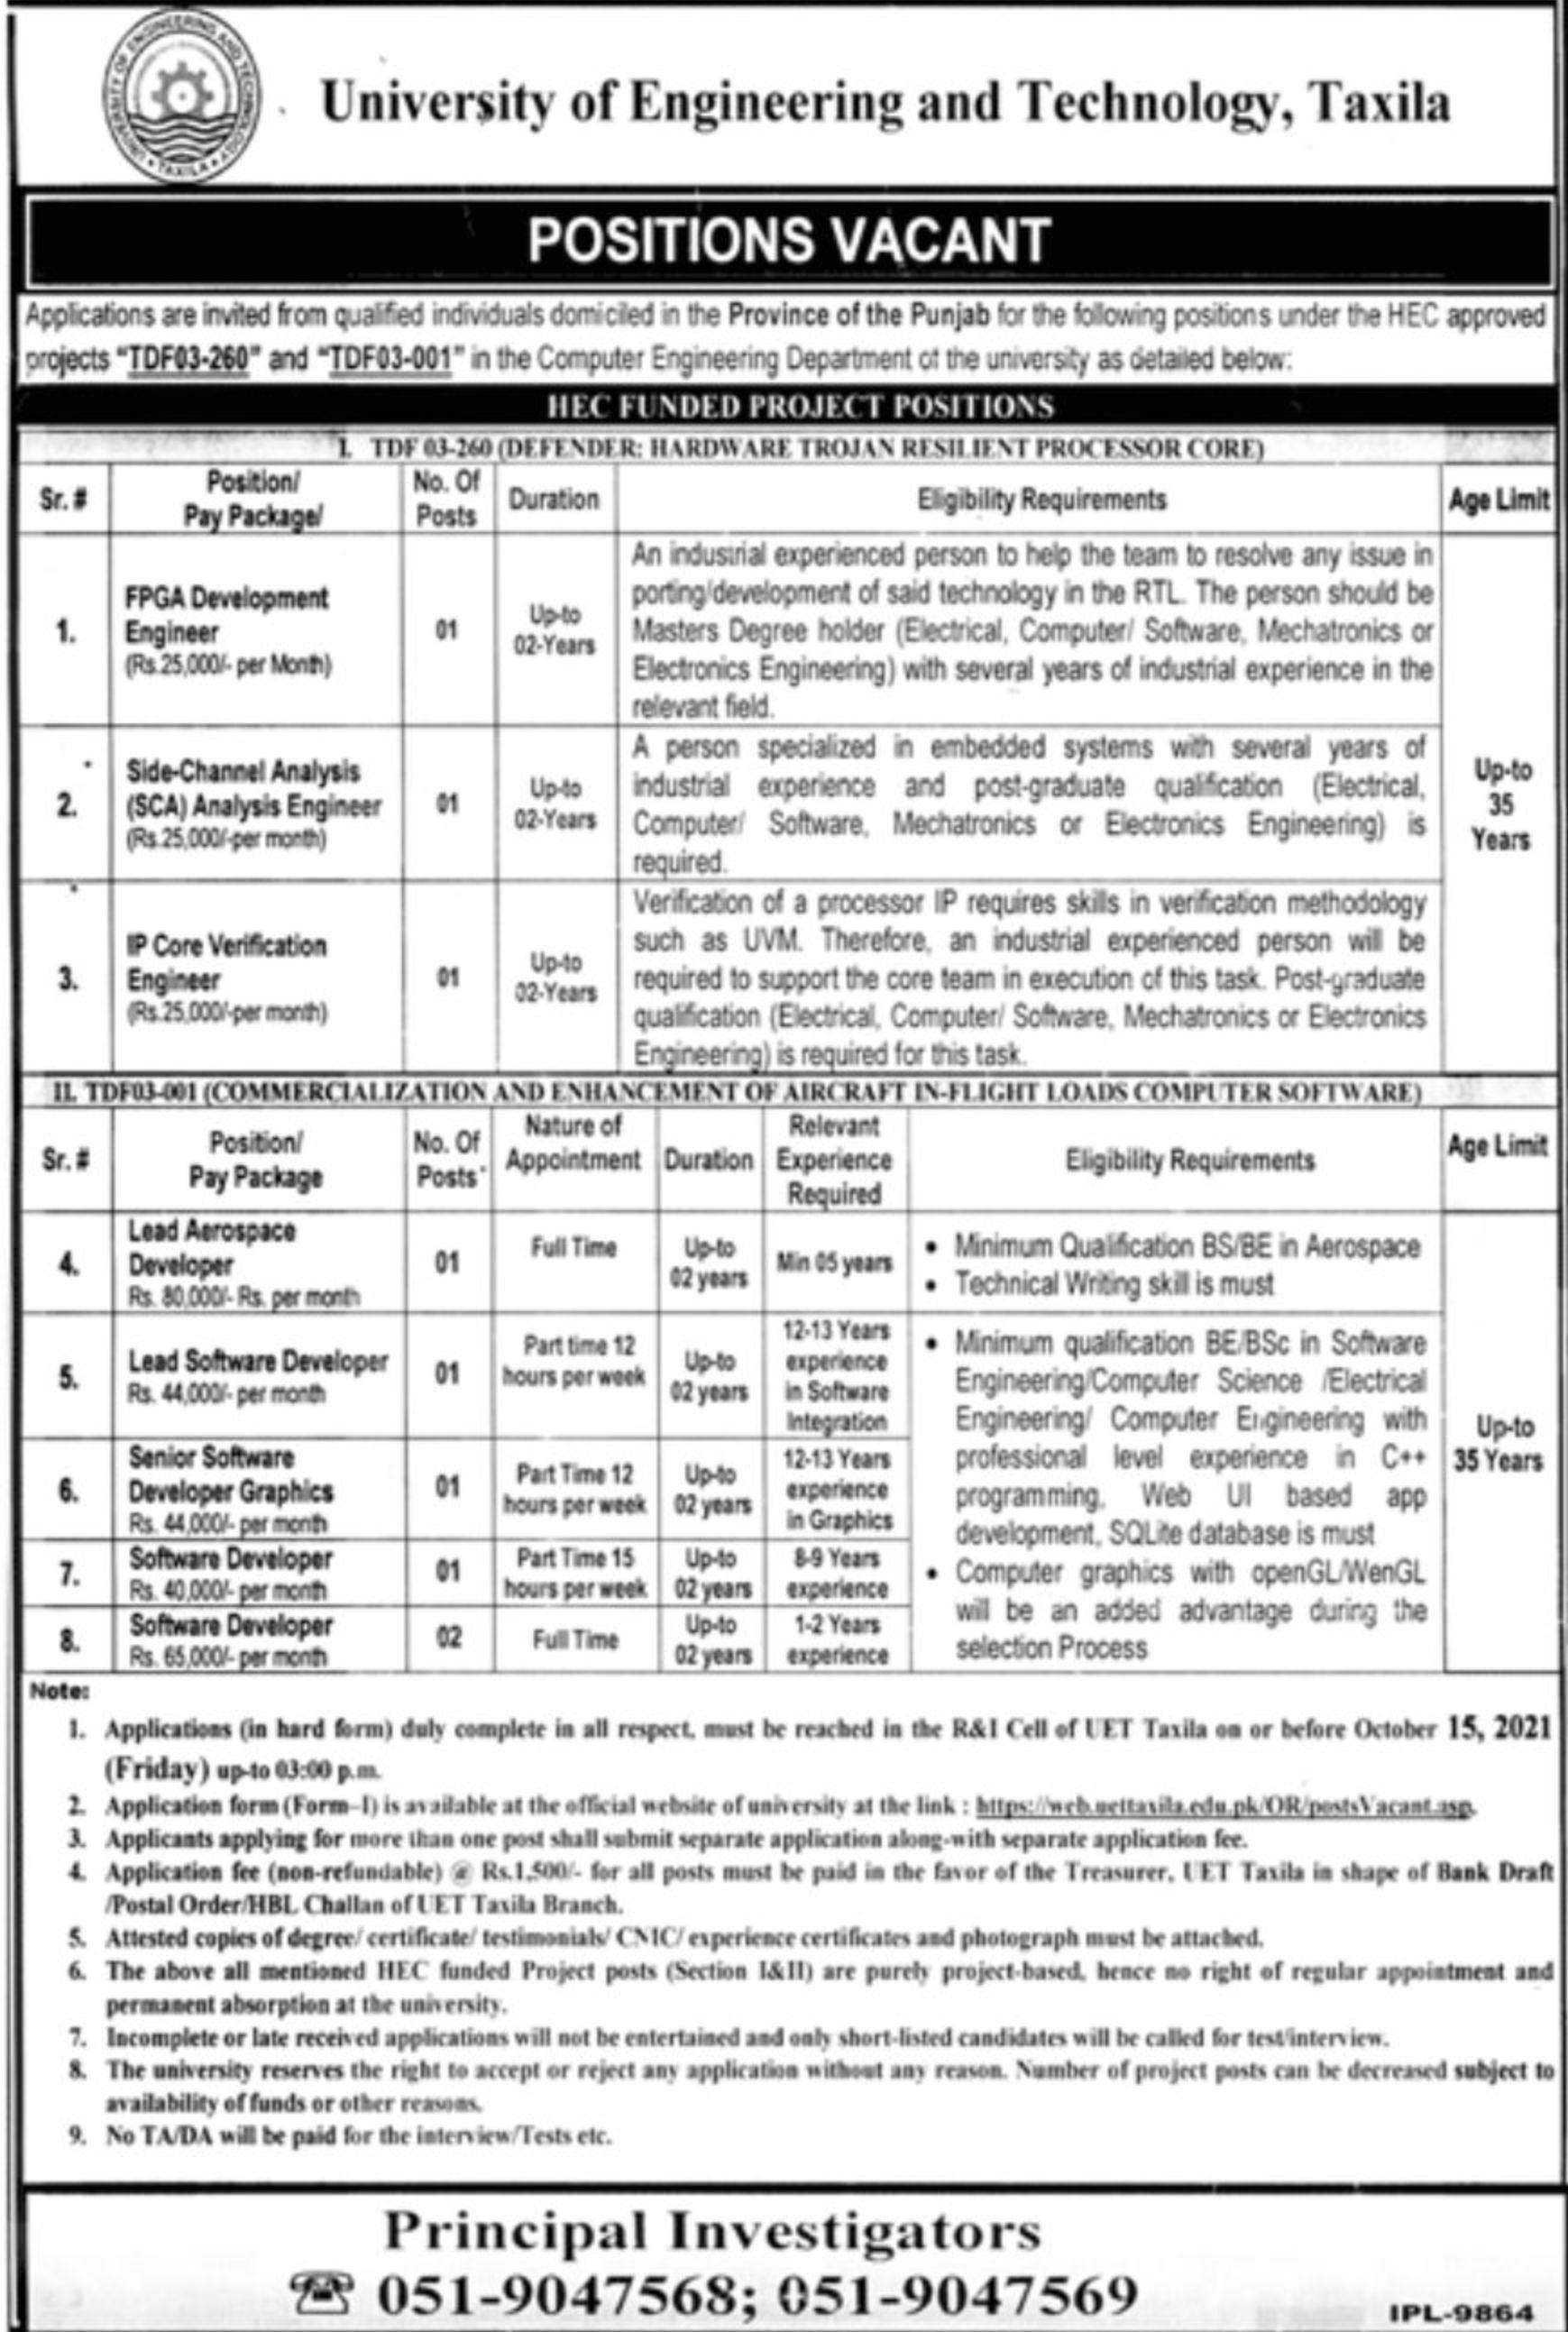 University of Engineering and Technology Taxila Vacancies 2021 – Latest Jobs 3